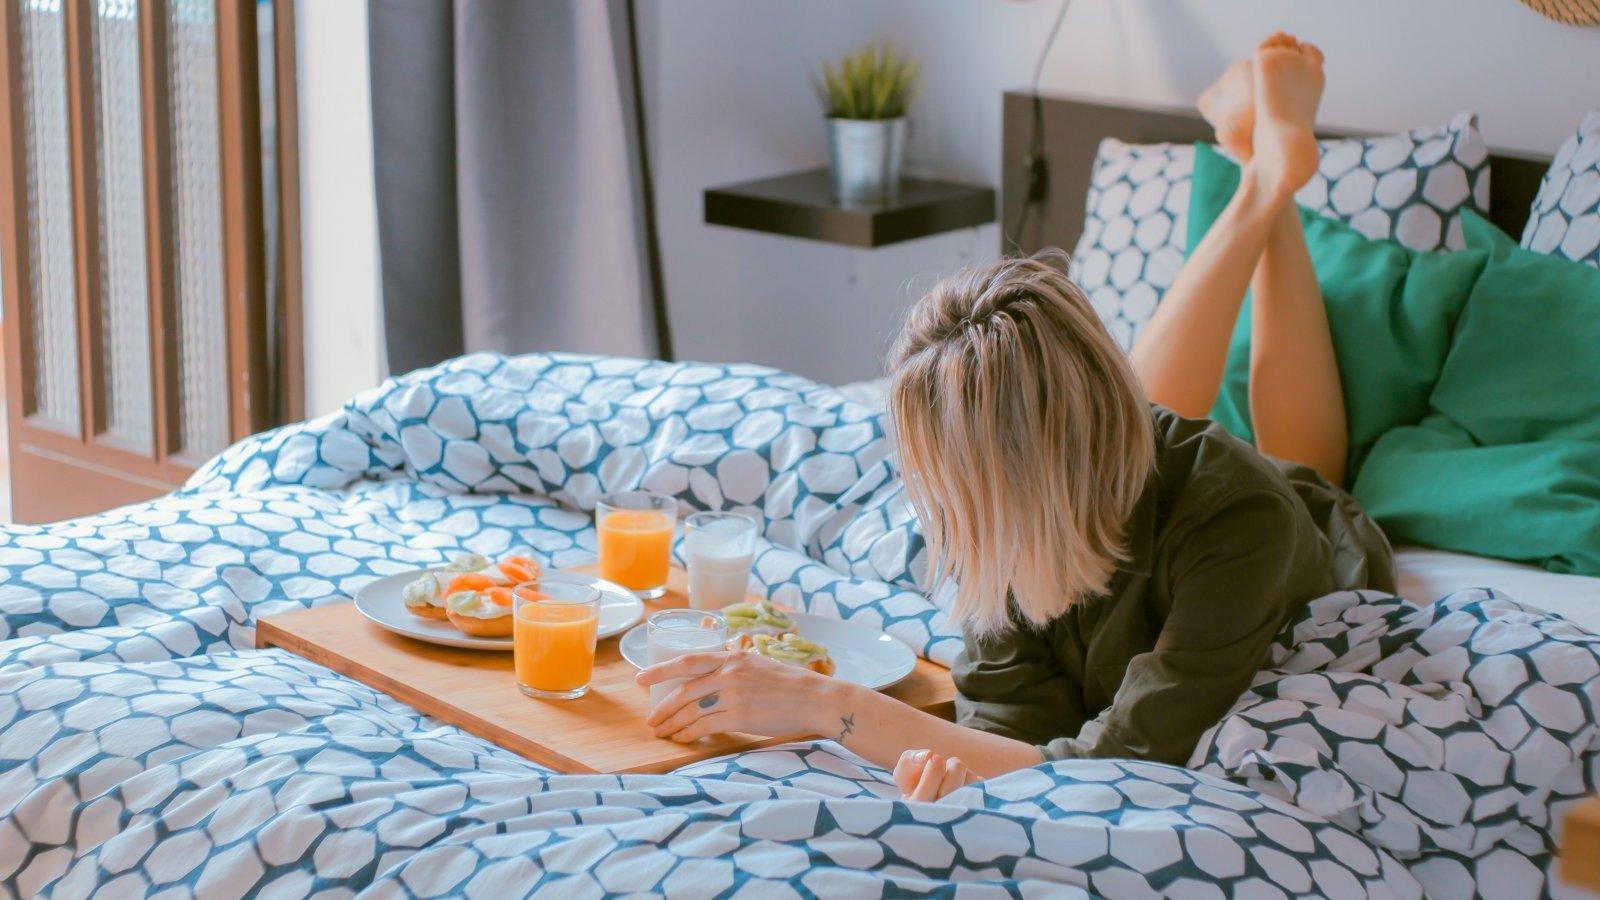 Planifica tus mañanas para poder ir más relajada.